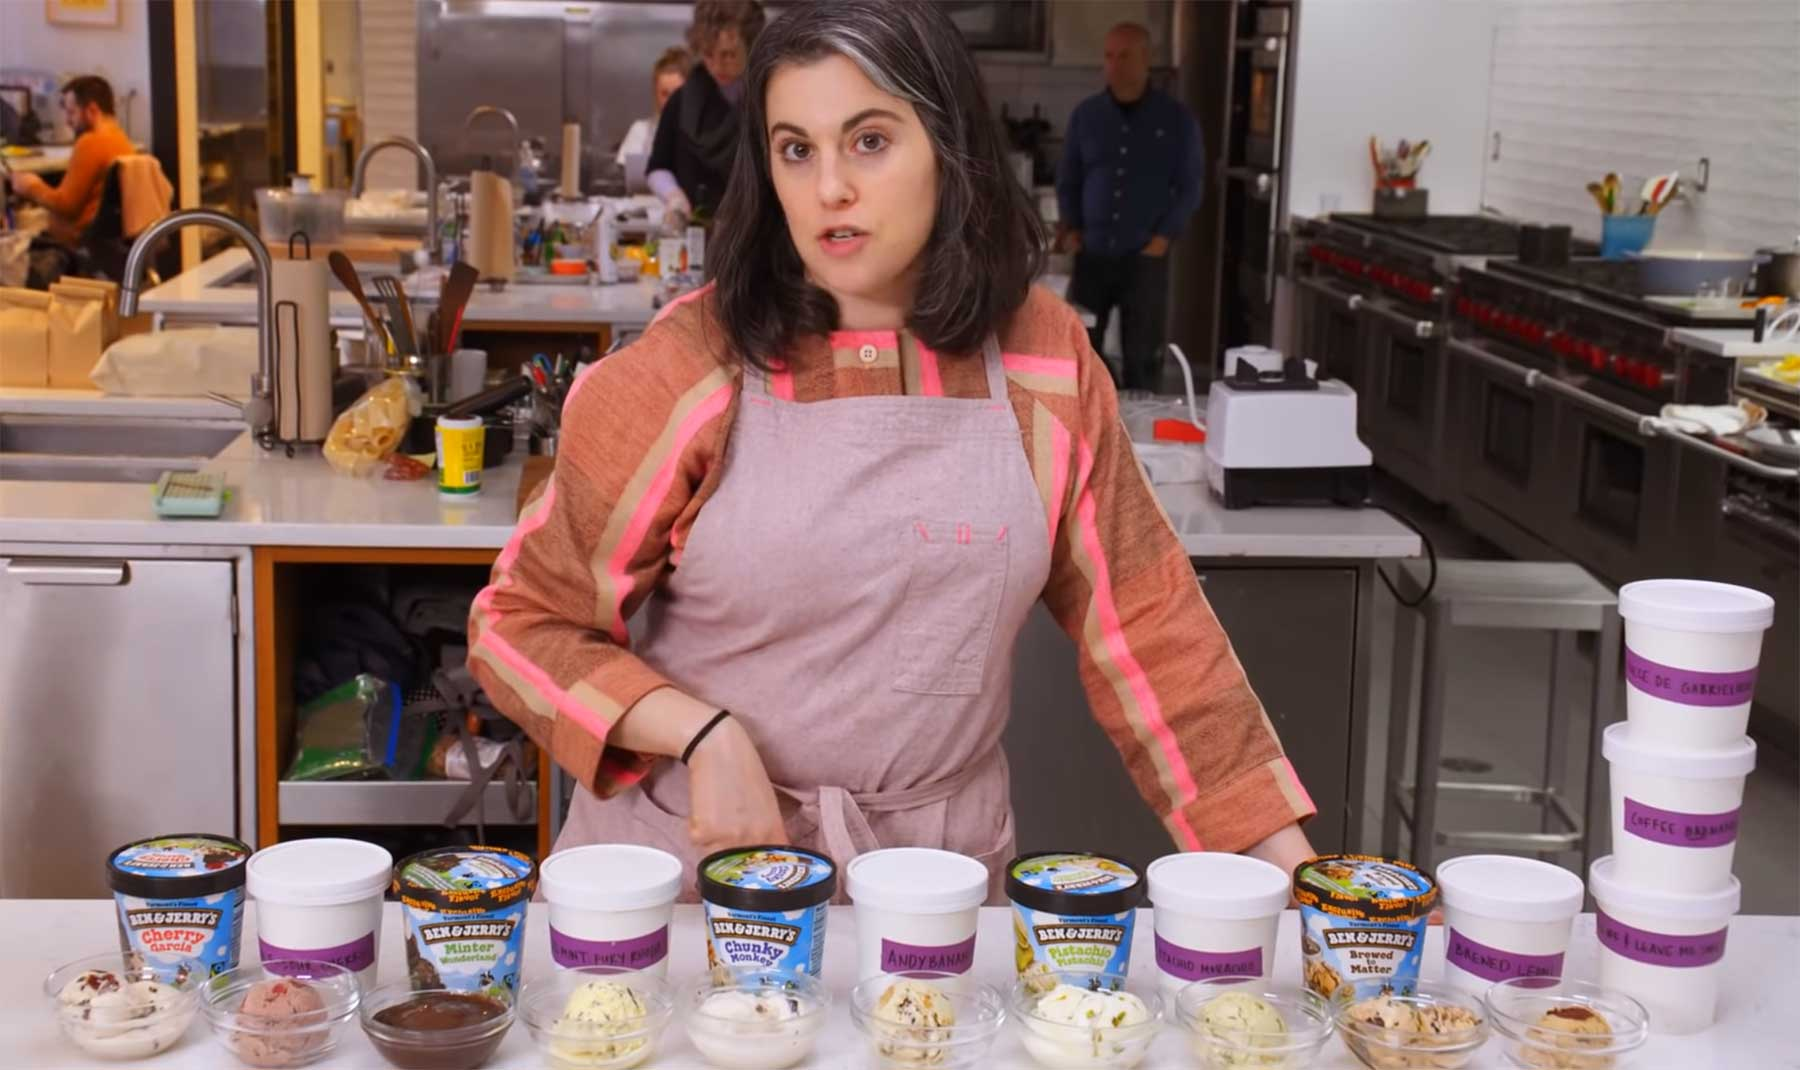 Gourmet-Köchin versucht, Ben & Jerry's Eis nachzumachen